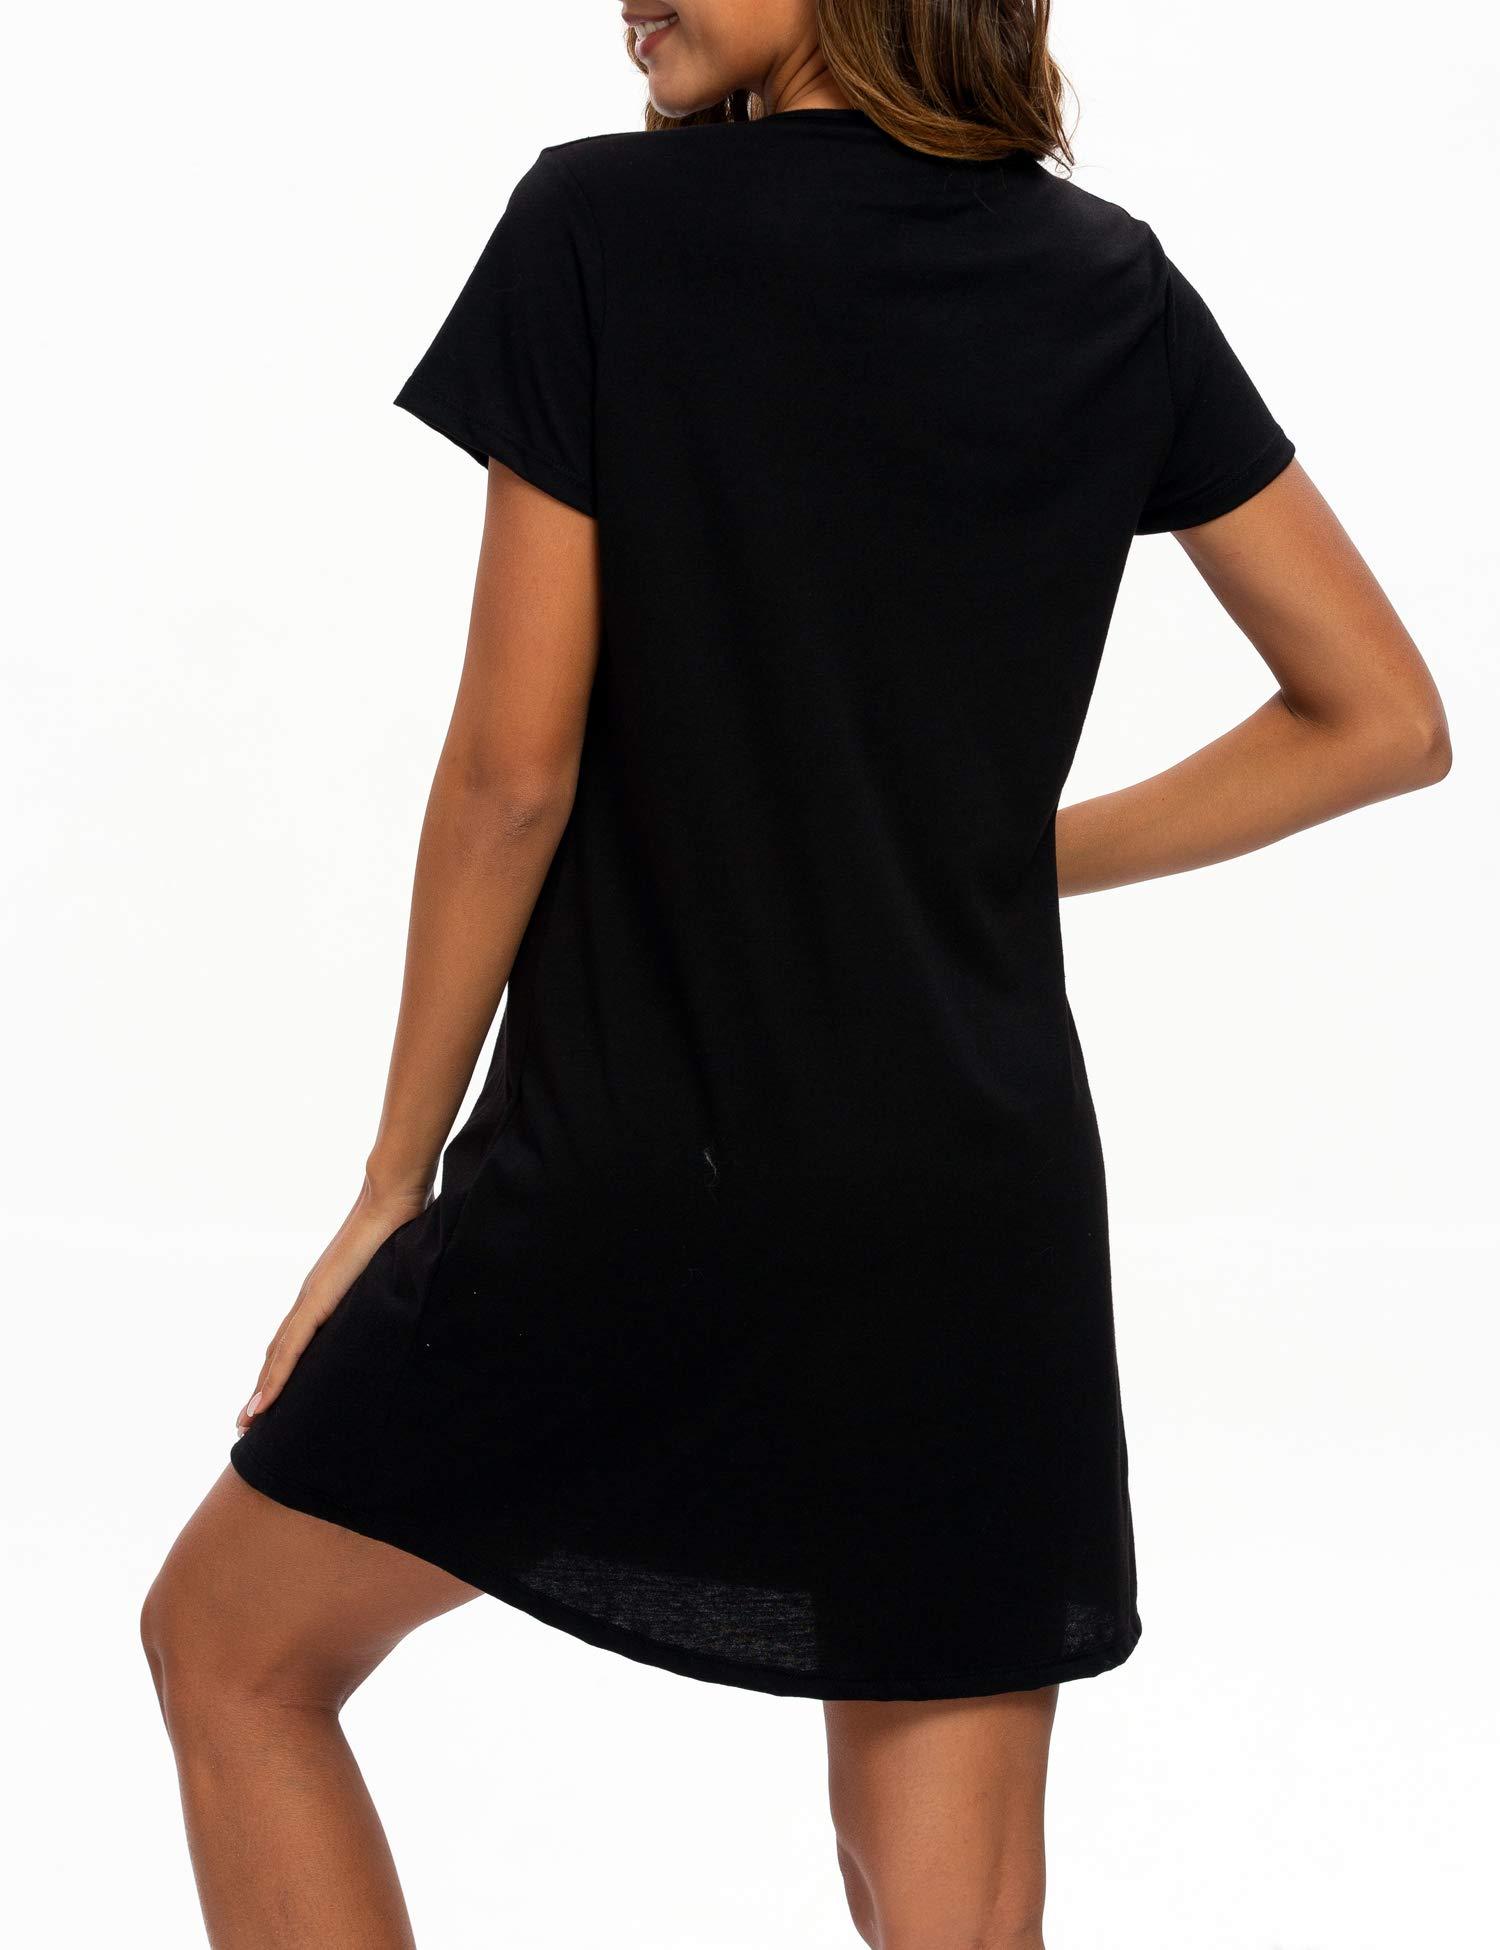 ENJOYNIGHT Womens Cotton Nightgown Short Sleeves Sleepwear Casual Print Sleepshirts (Black, Large/X-Large)